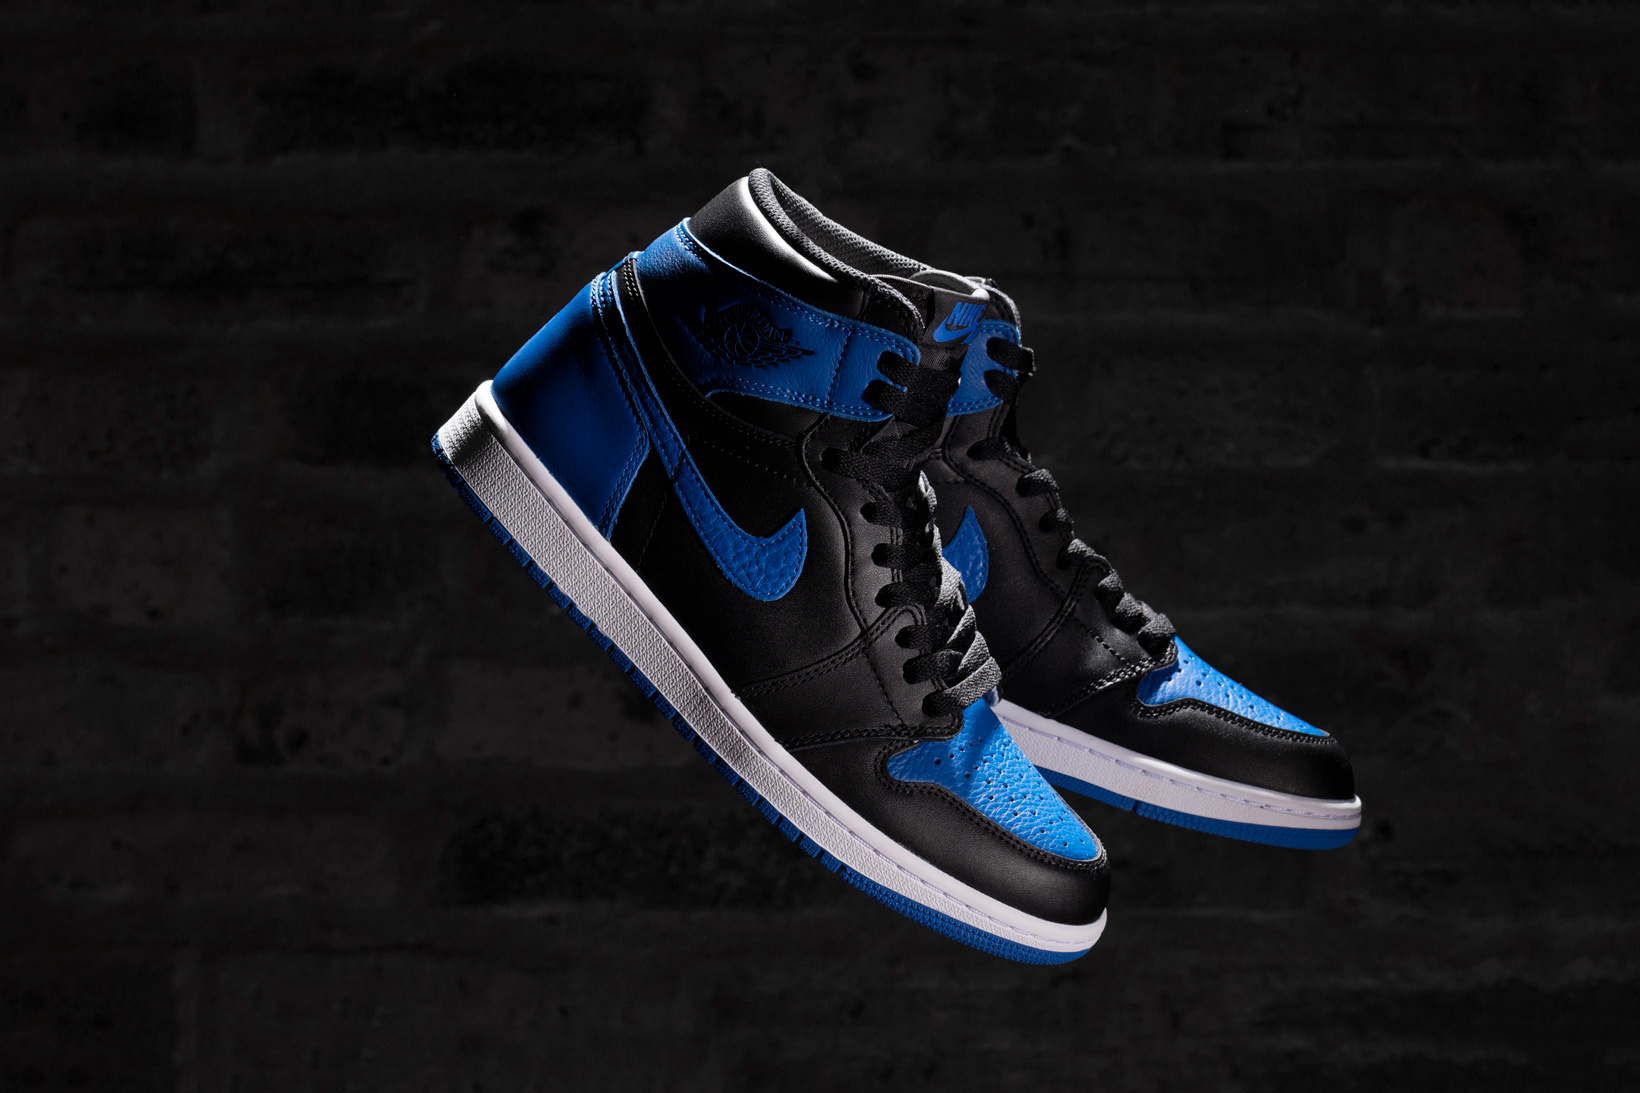 The Air Jordan 1 Retro High Og Royal Will Be Dropping On